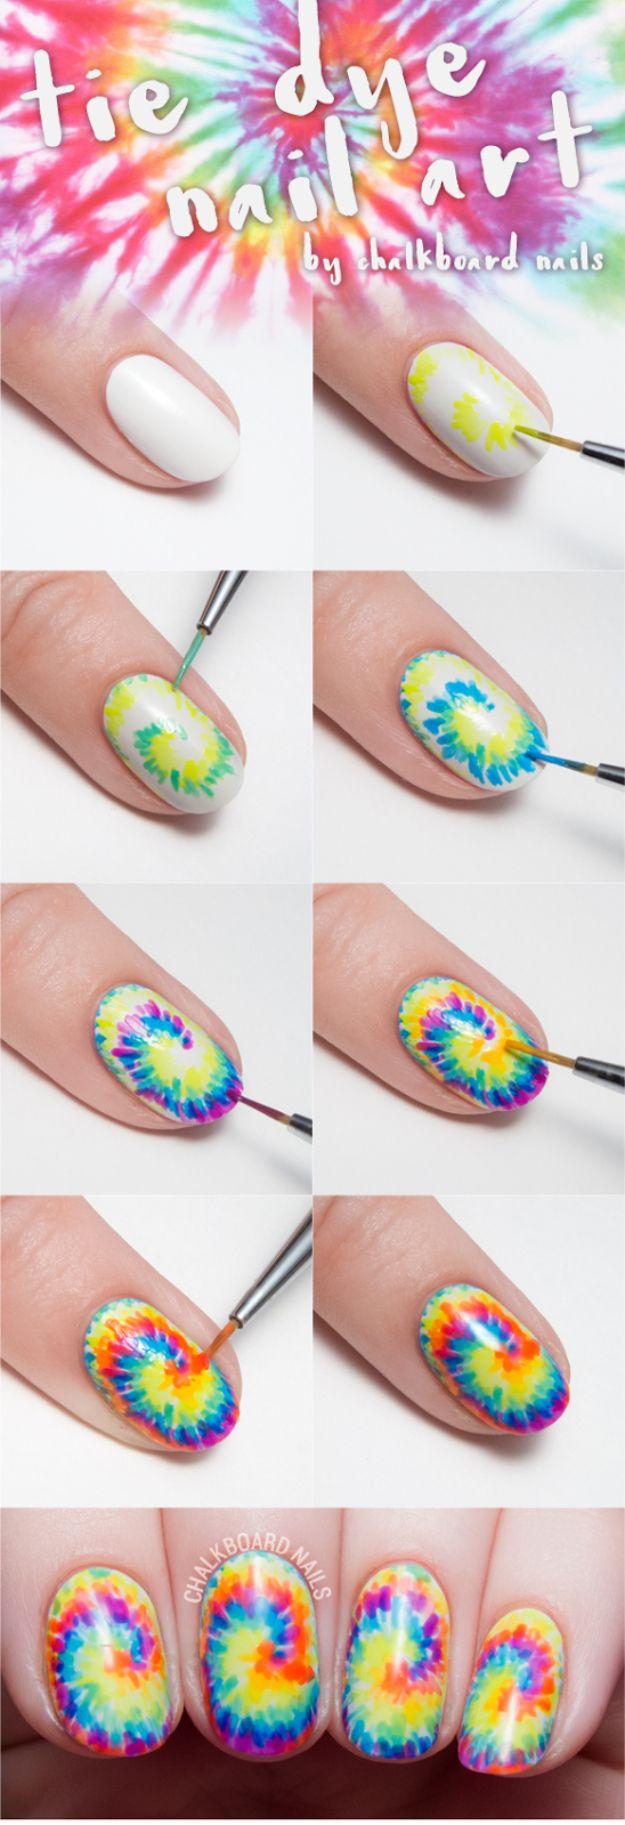 Diseño de uñas estilo hippie uñas pinterest tie dye nails art